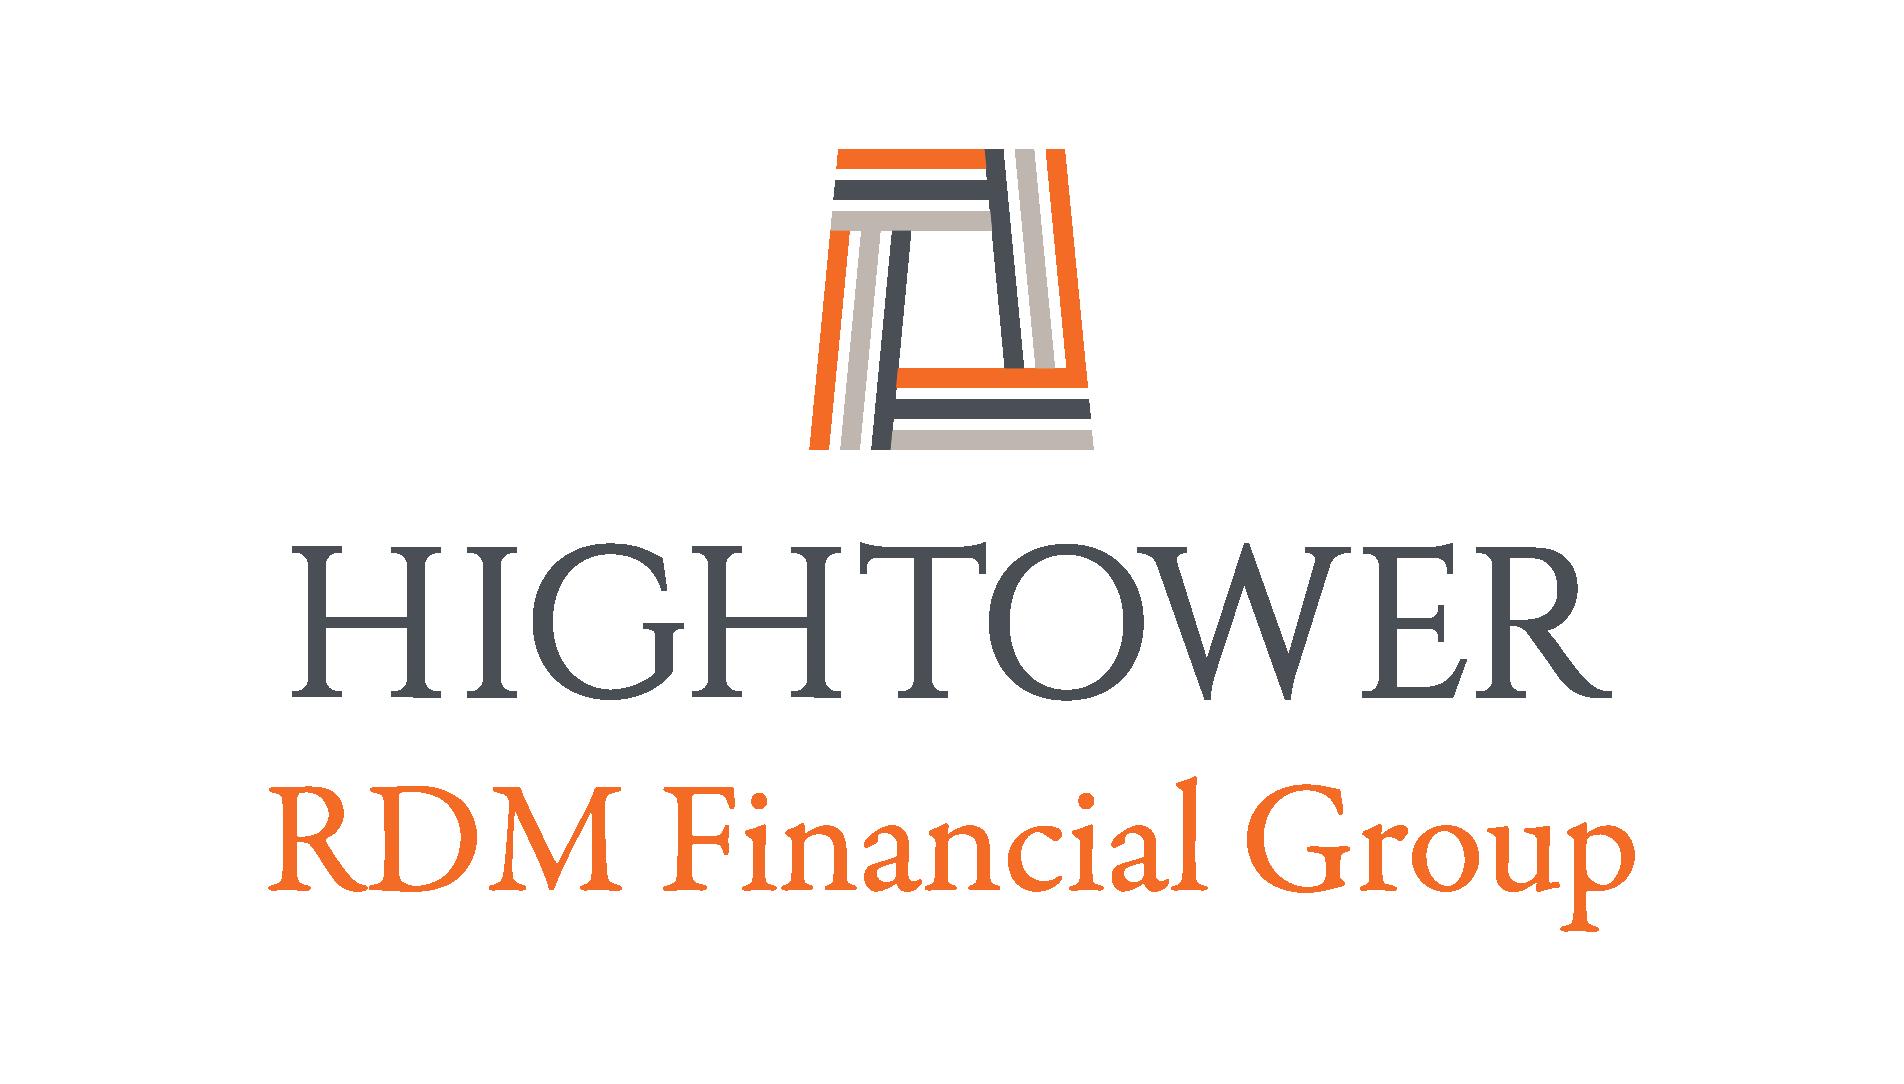 RDM Financial